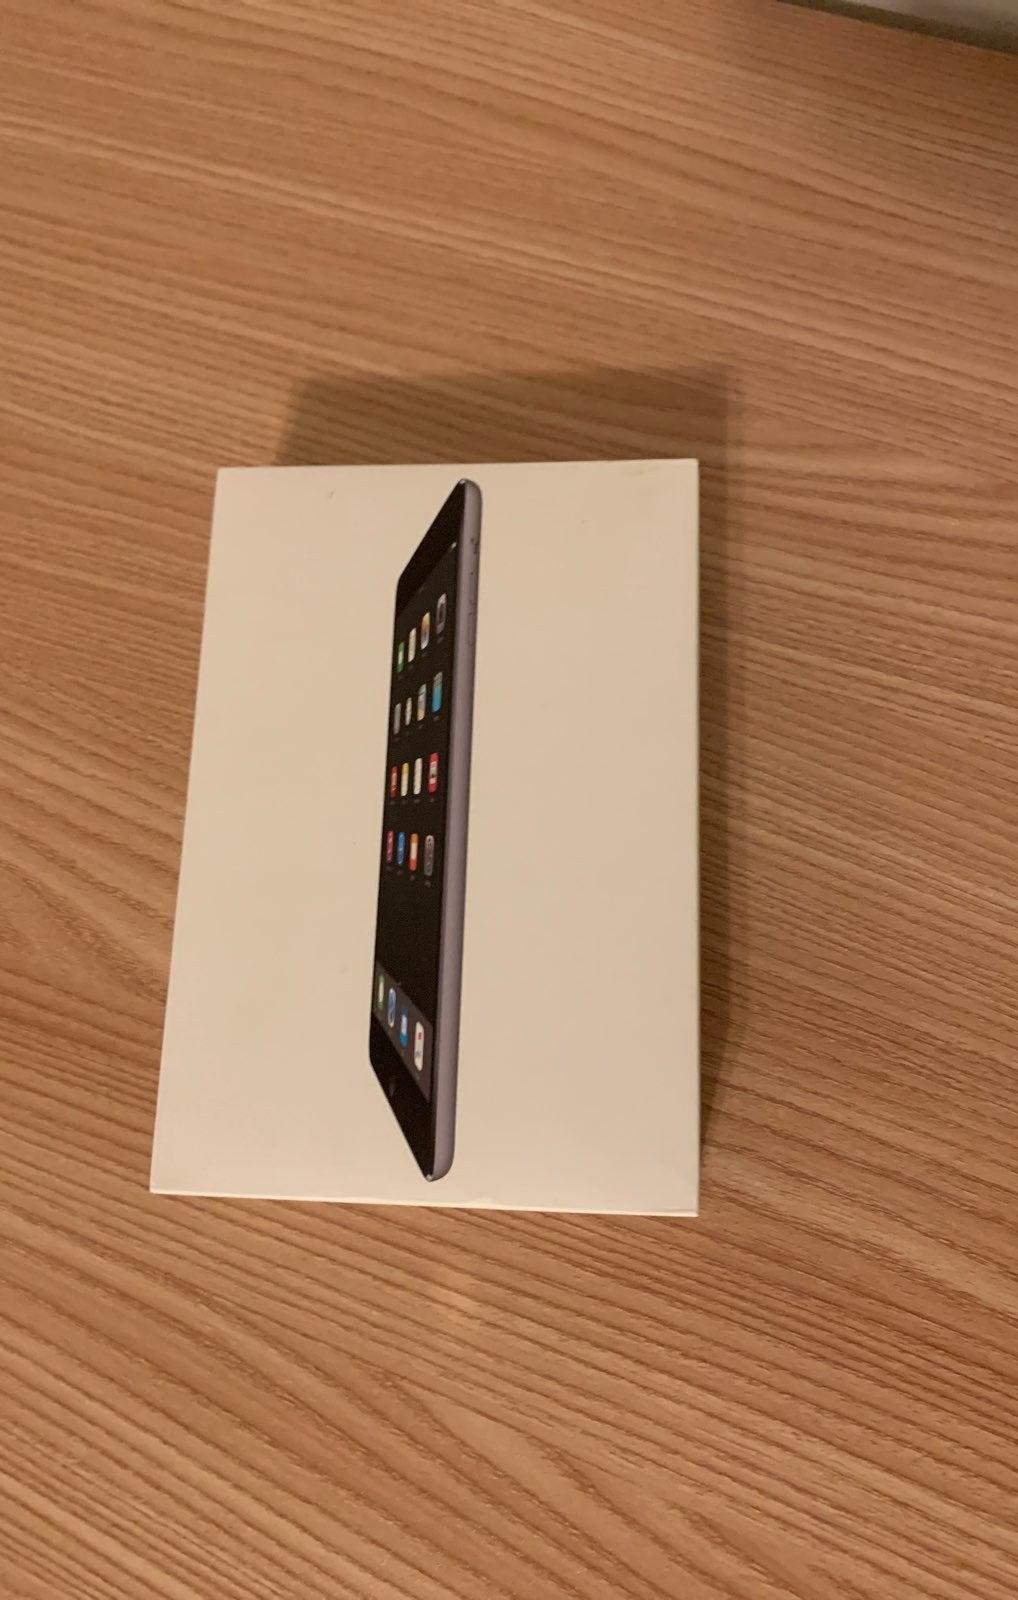 iPad mini 2nd generation Space Gray